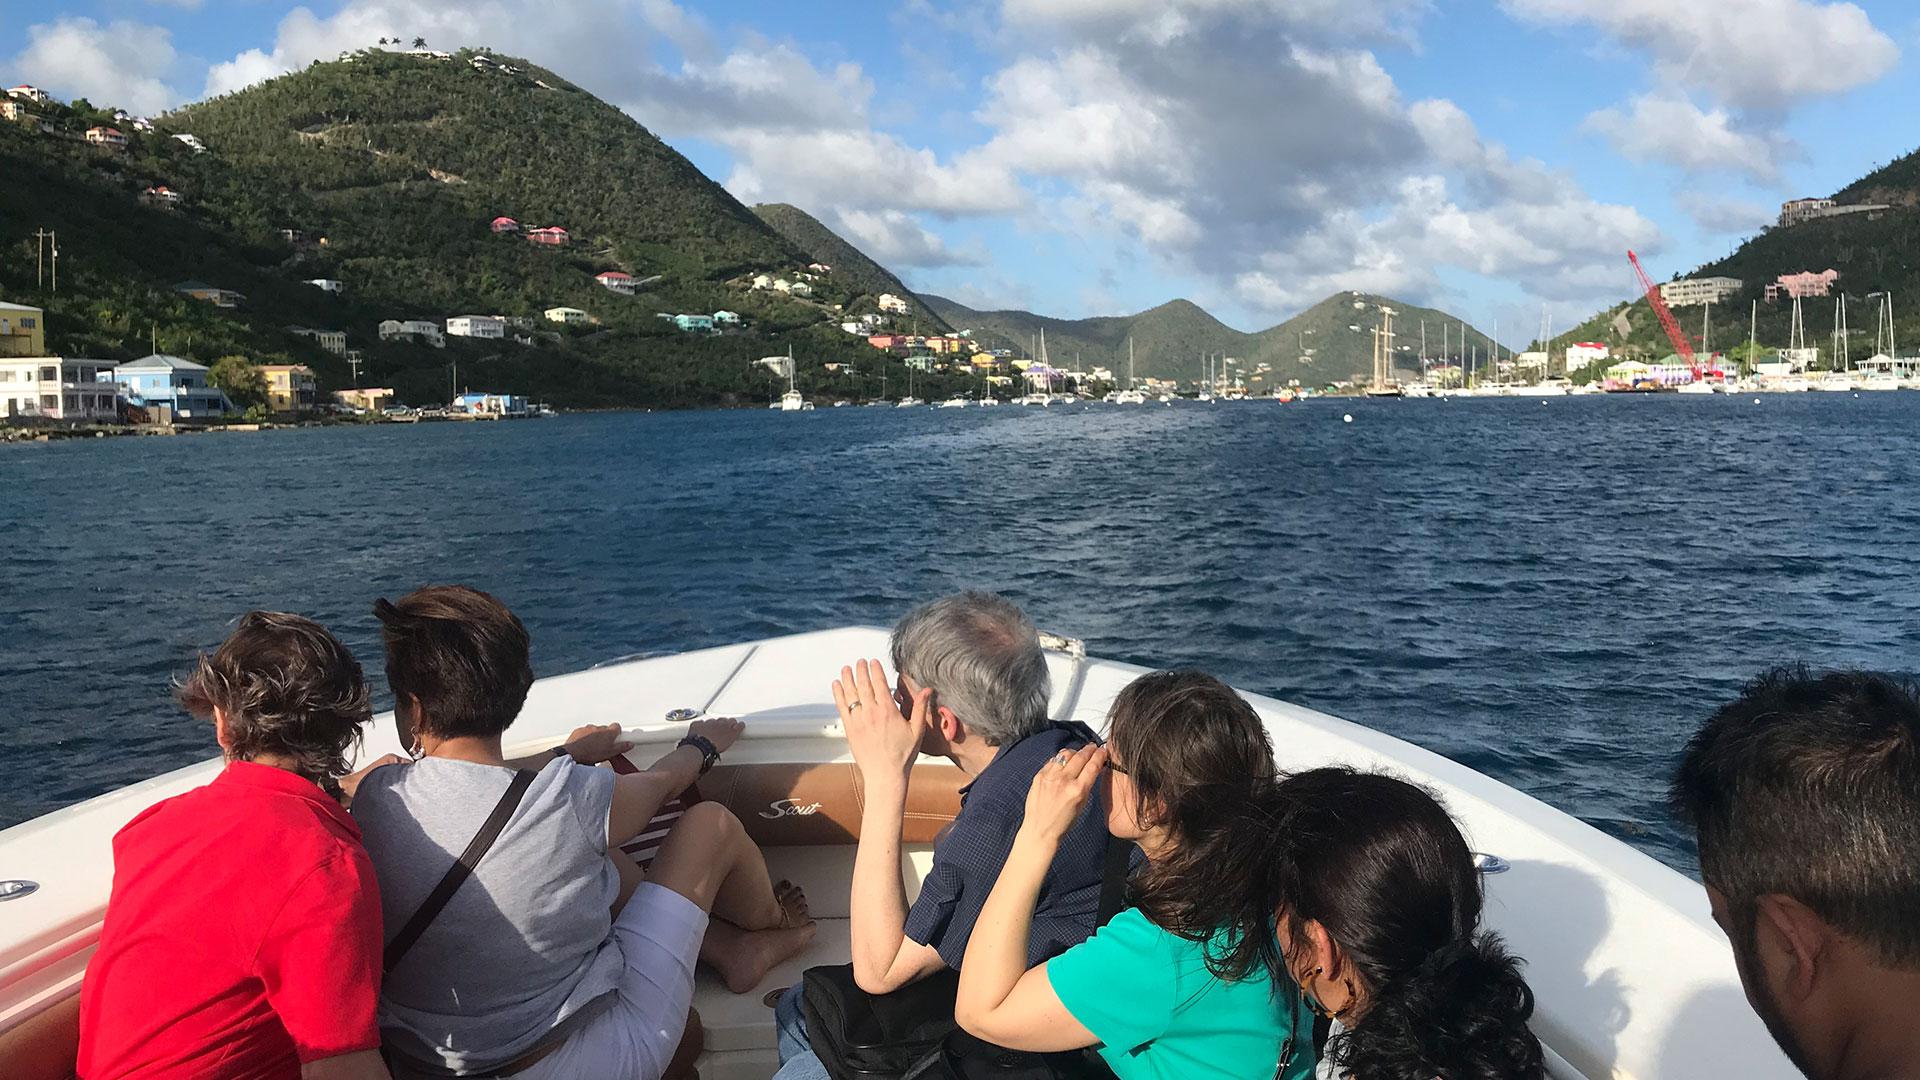 zingara-scrub-island-arrival-1